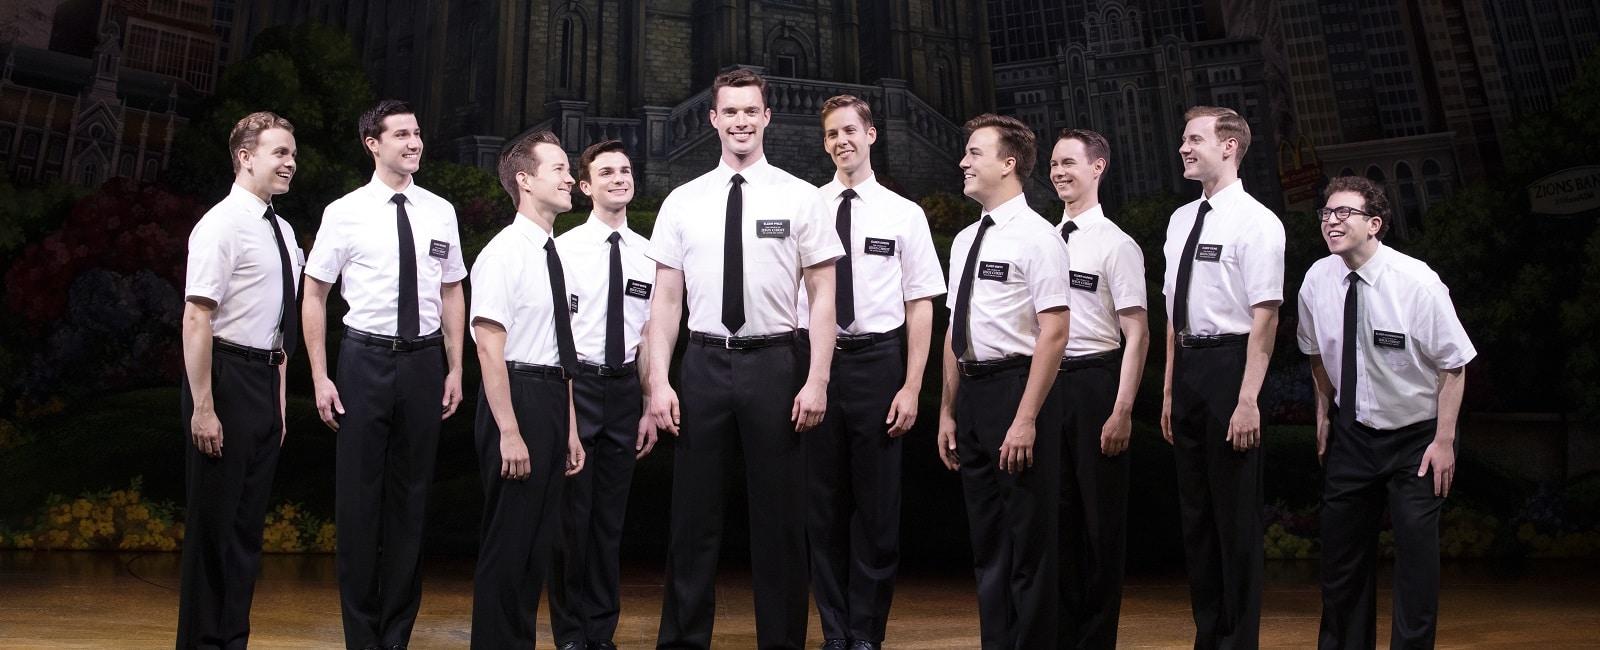 The Book of Mormon Company - The Book of Mormon (c) Julieta Cervantes 2019